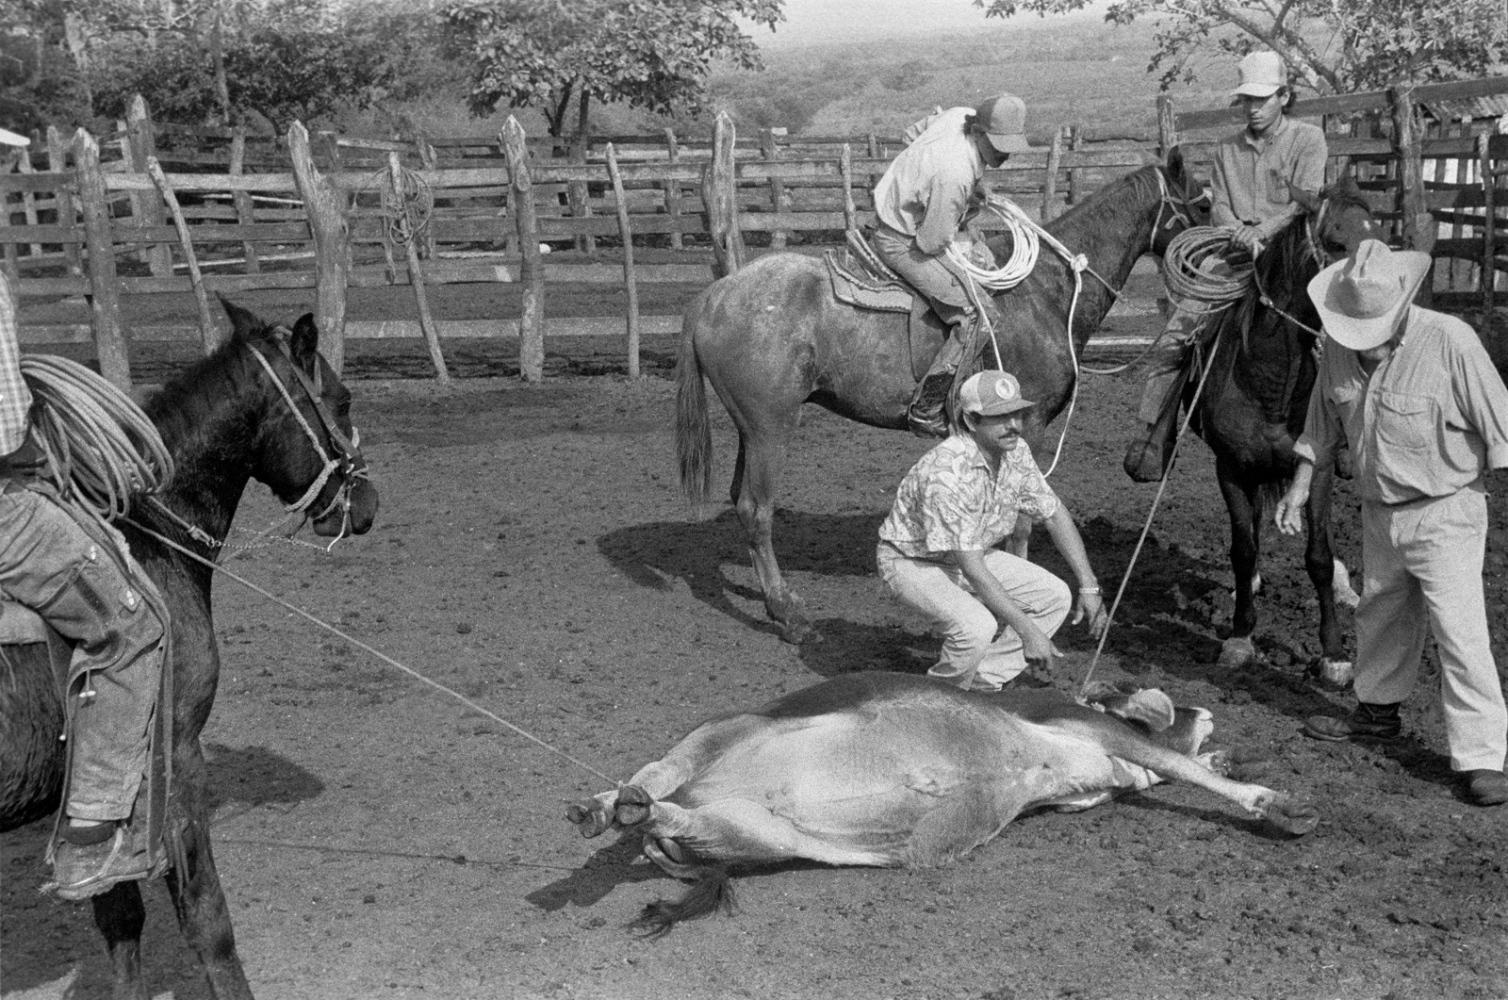 Leo de Swaan,(my other brother in law,) rancher & Huapango singer(on the far right) branding hiscows atRancho Tamyan., Ozuluama, Veracruz1985 ©Sylvia de Swaan